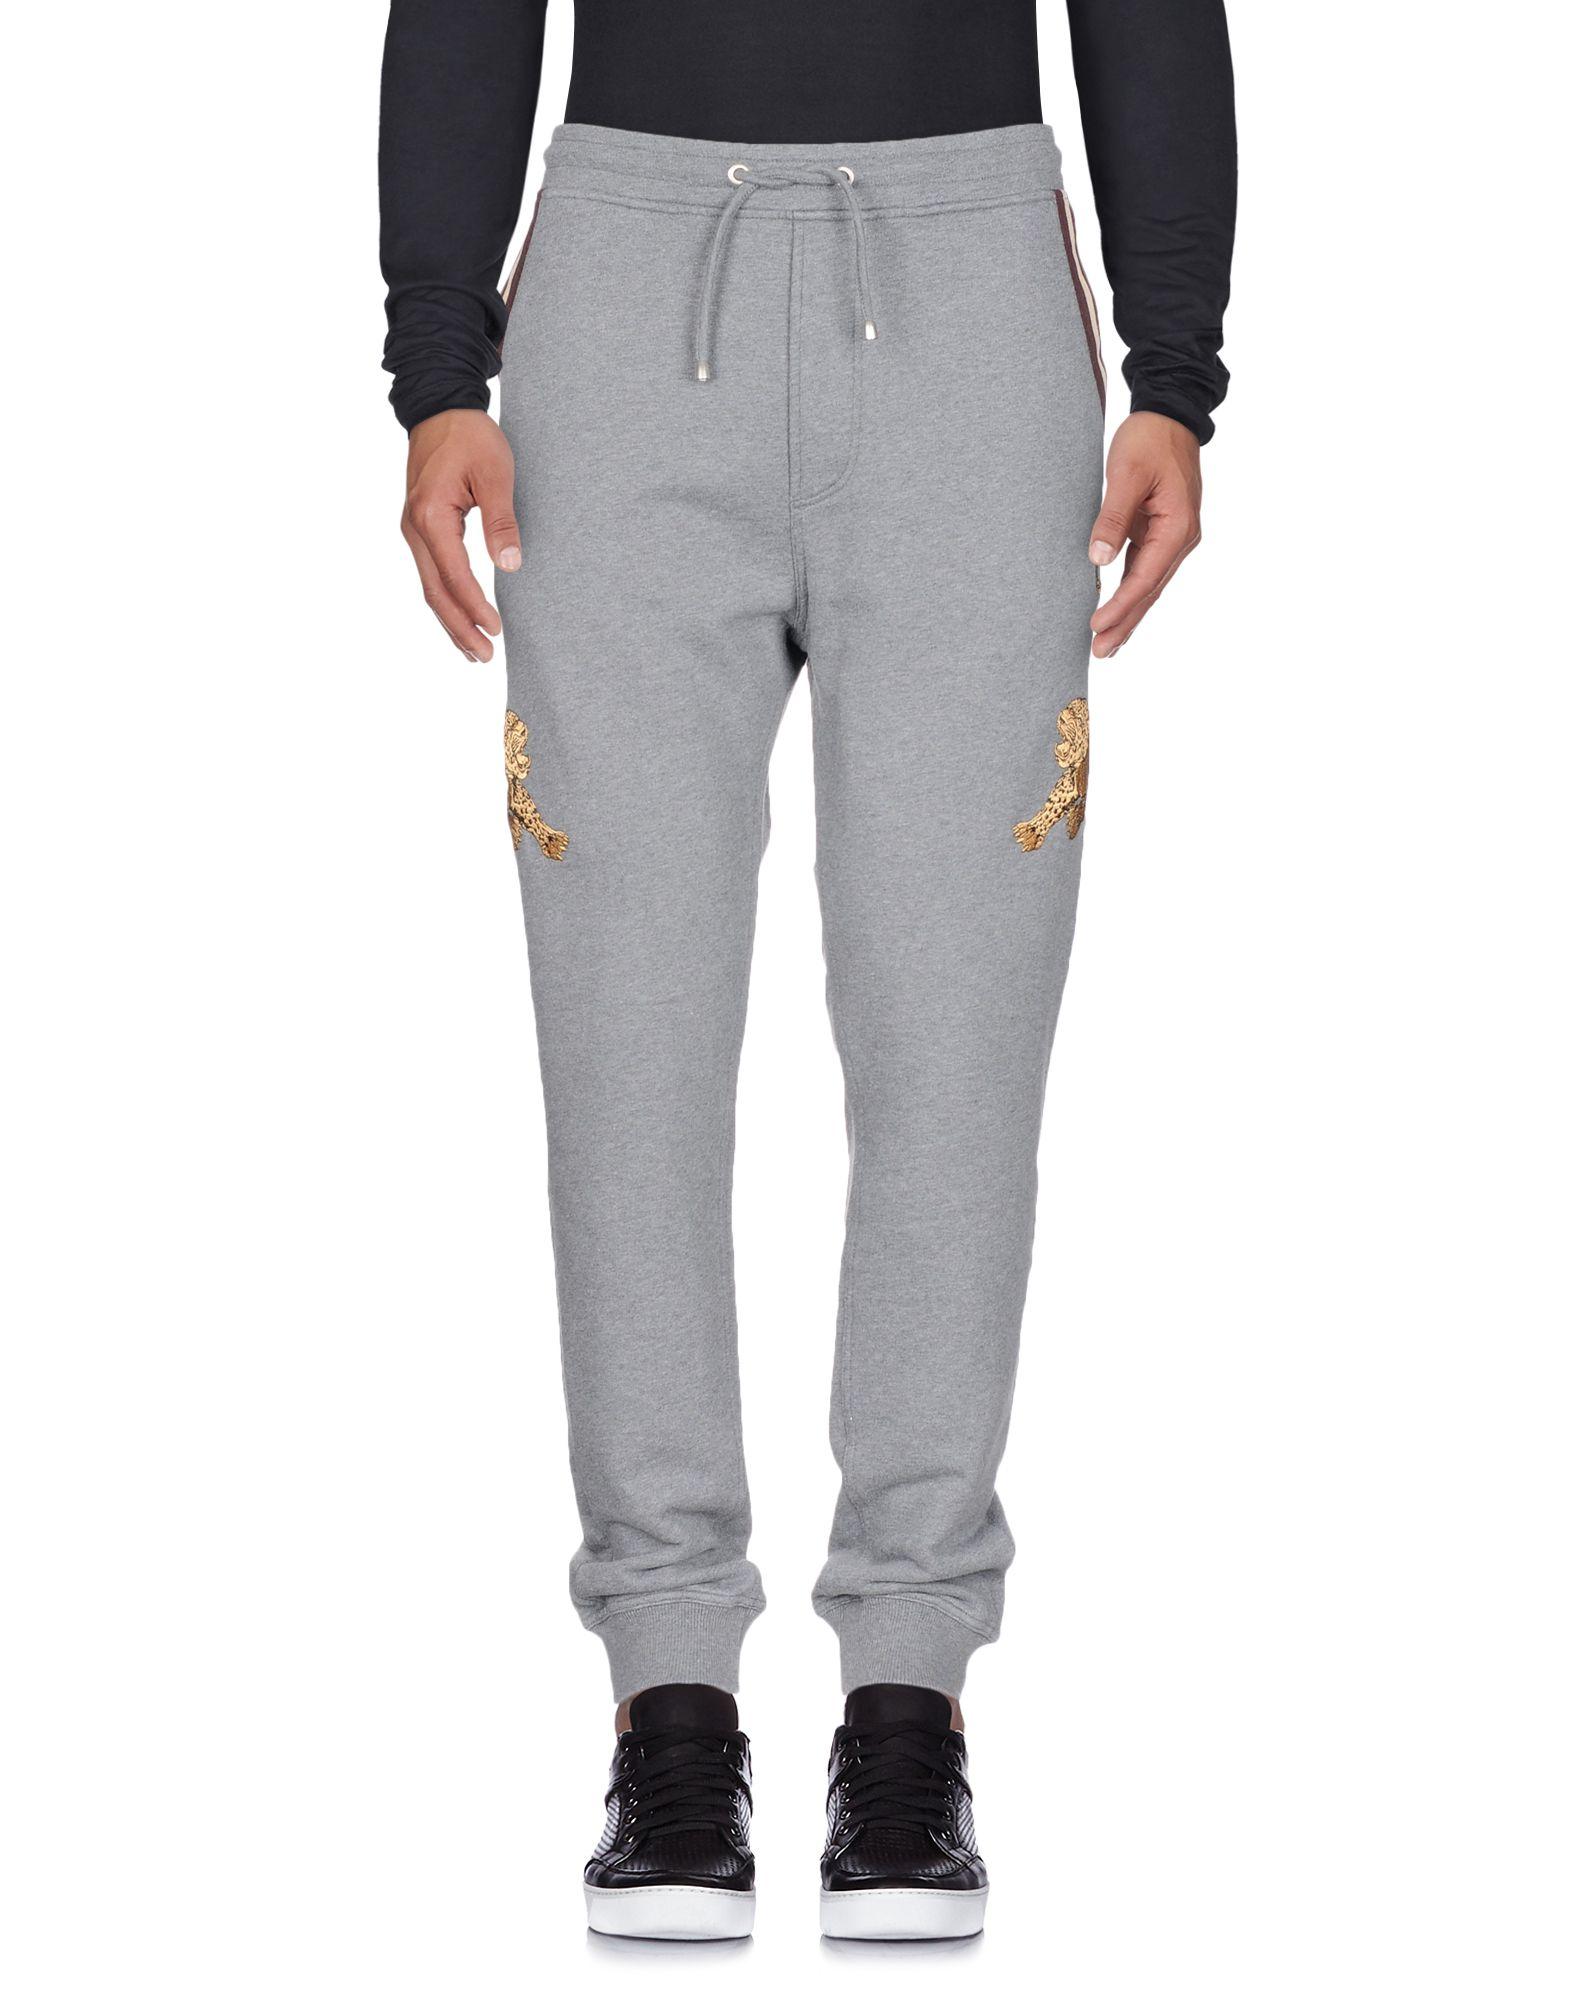 Pantalone Just Cavalli Donna - Acquista online su